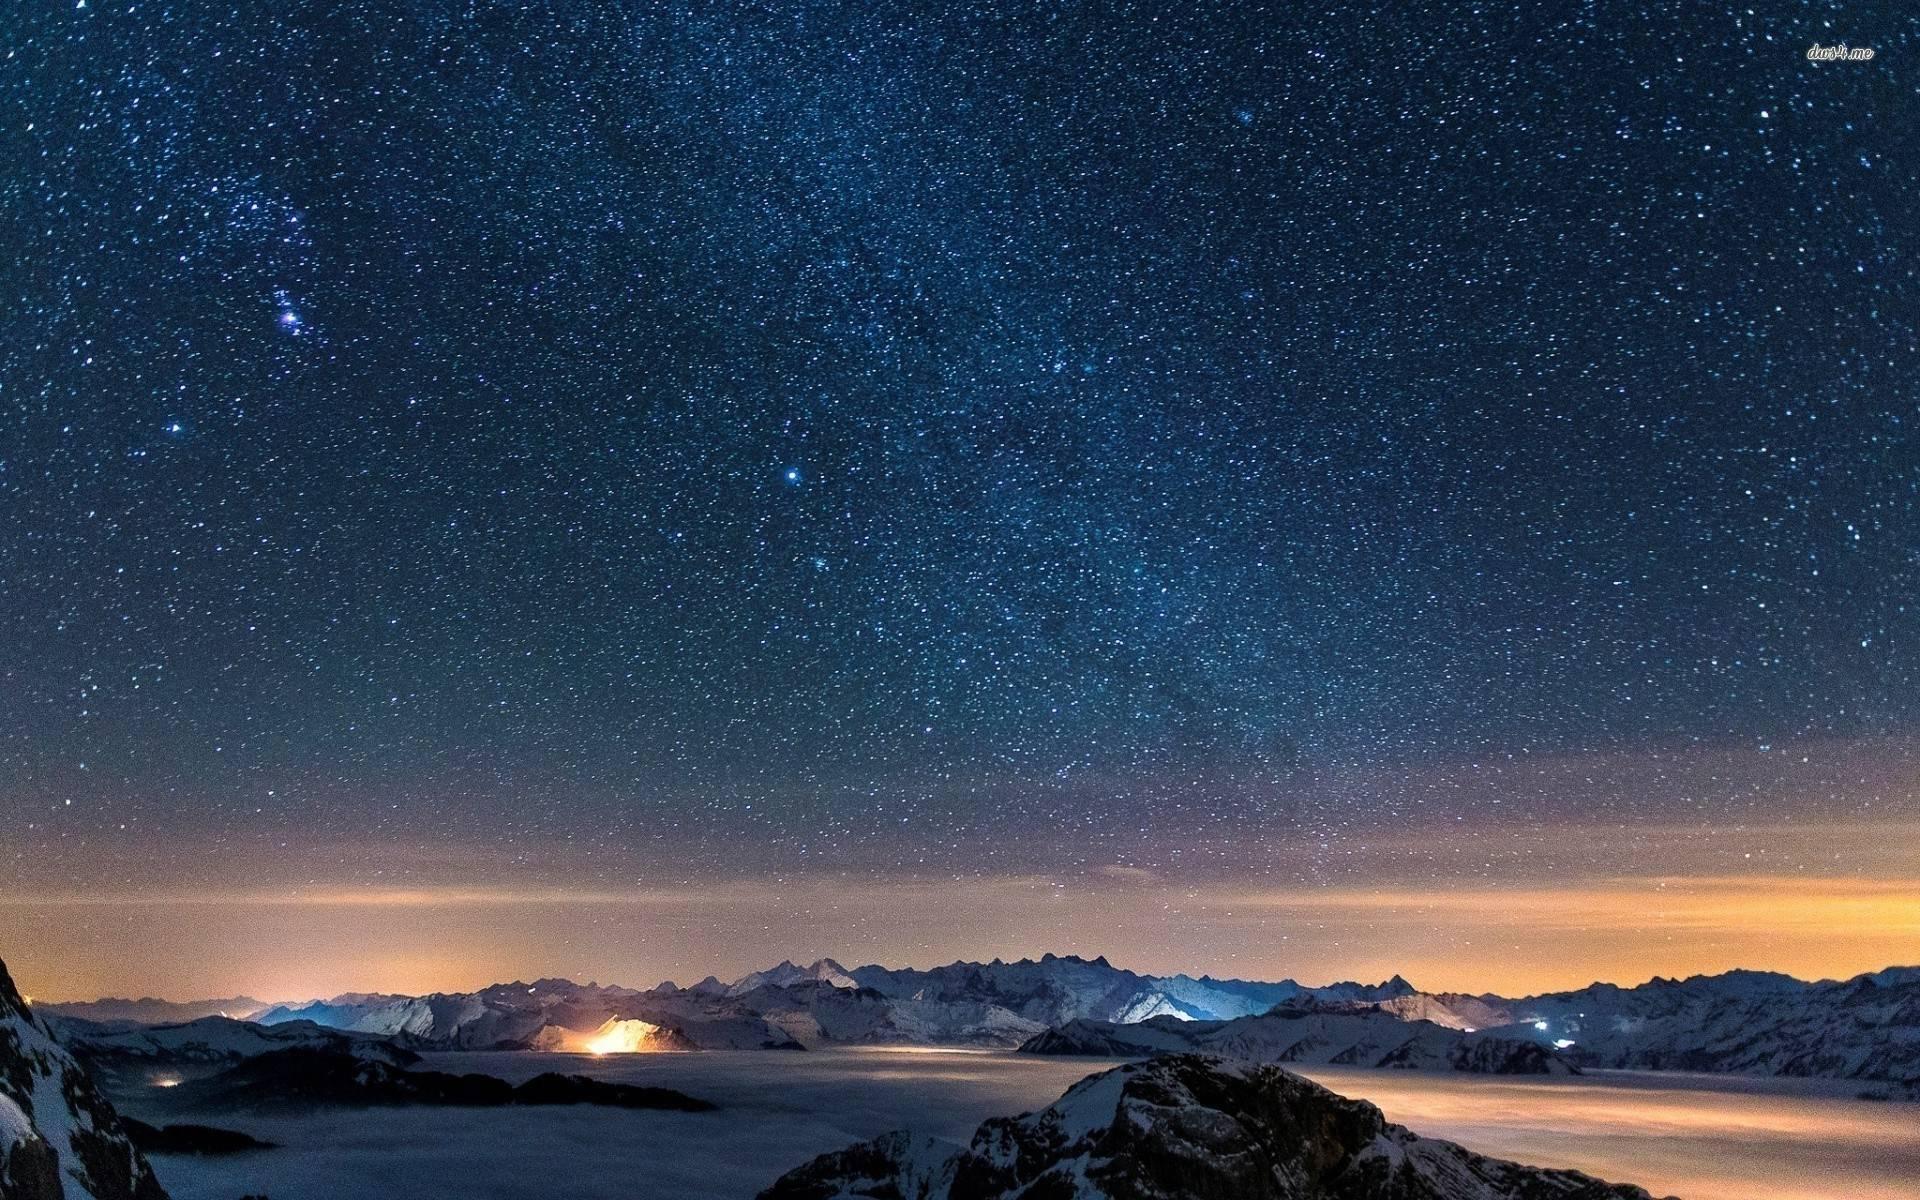 Starry Night Sky Wallpapers 1920x1200